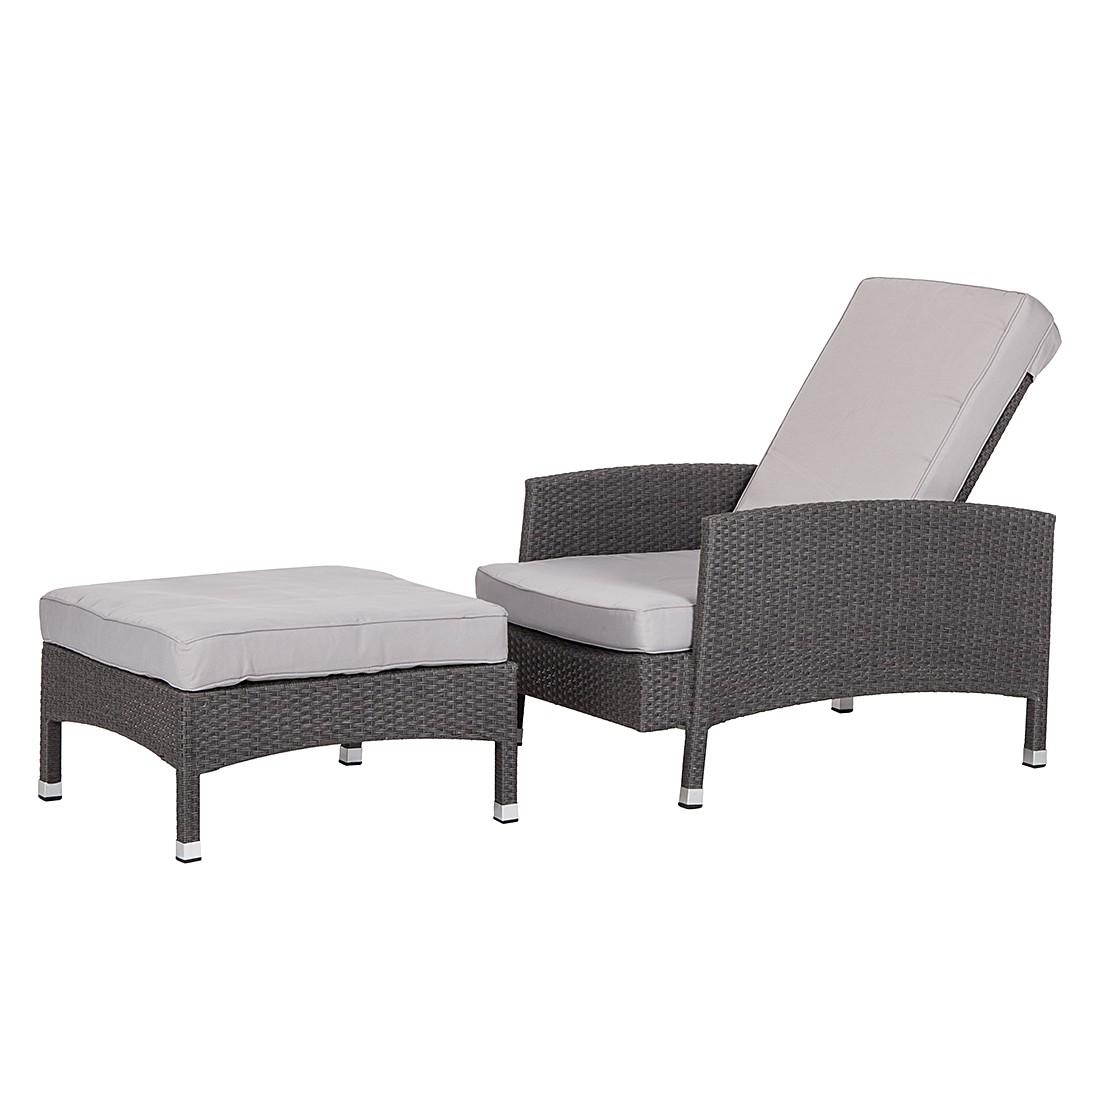 Sessel-Set Paradise Lounge (mit Hocker) - Polyrattan Grau, Fredriks